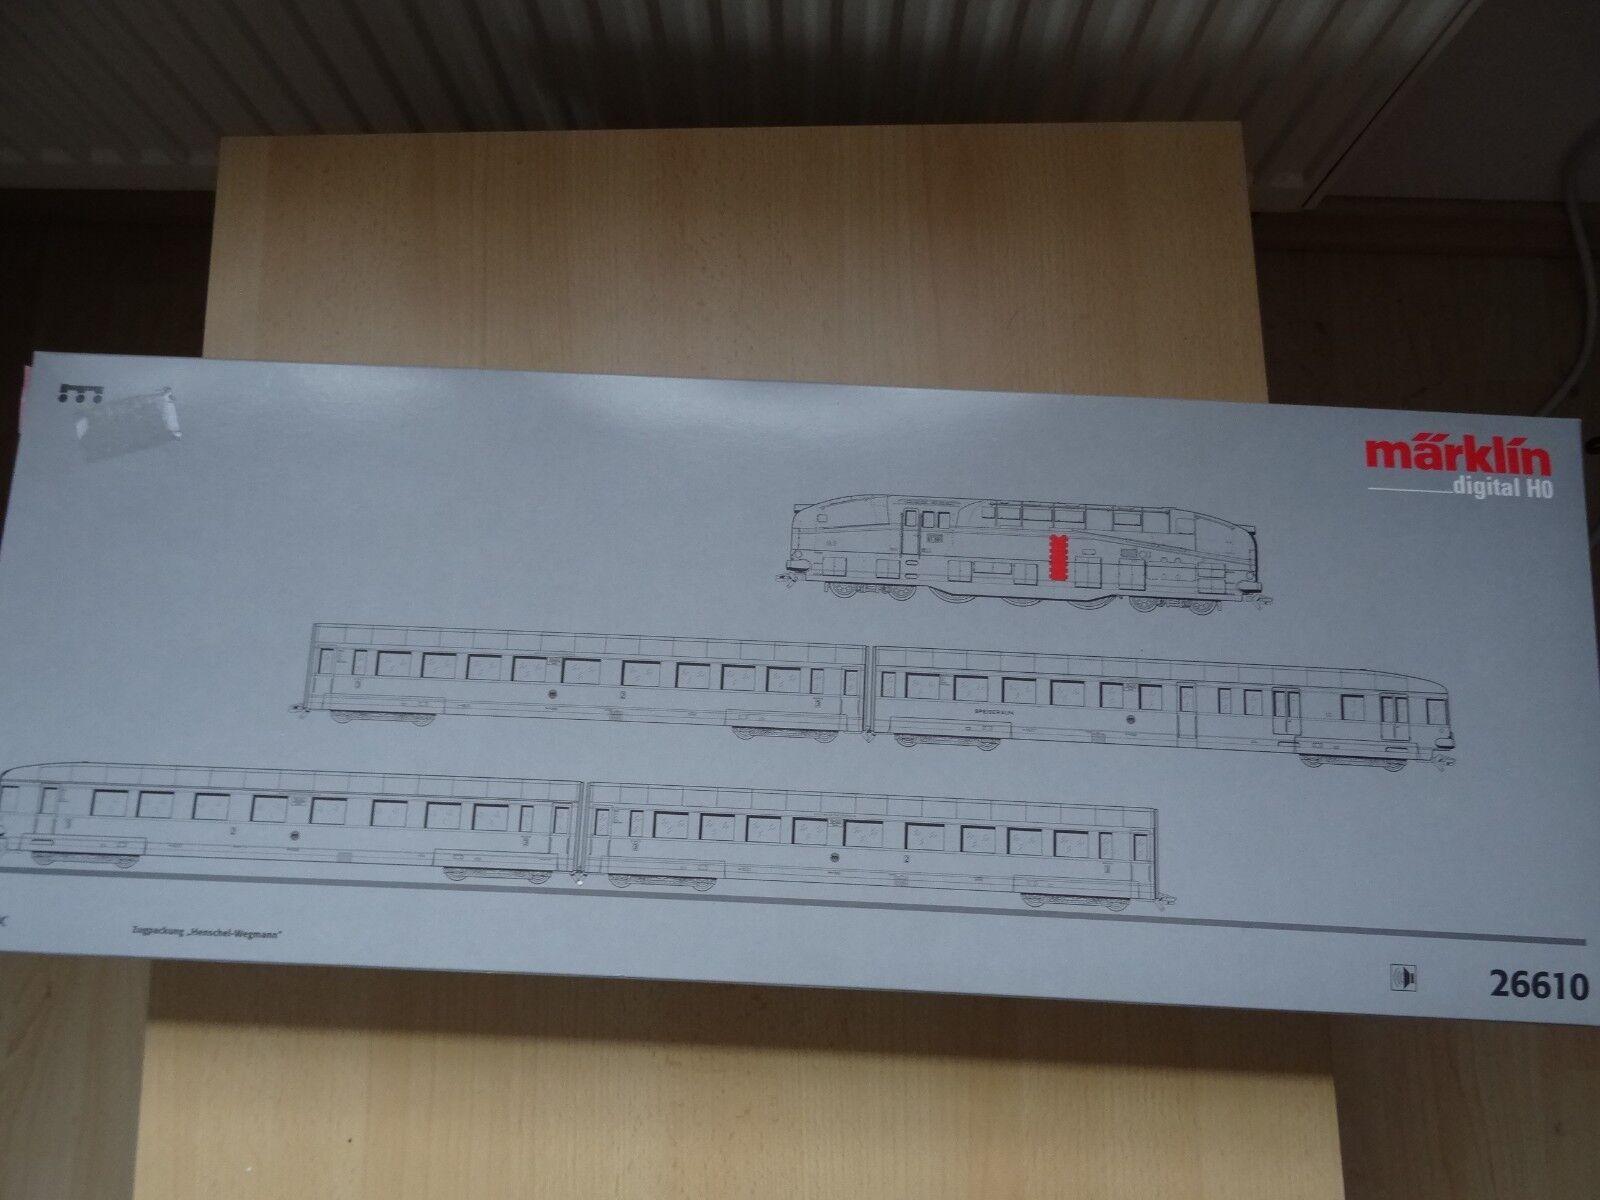 Marklin ho Art 26610 zugpackung Henschel Wegmann OVP como nuevo